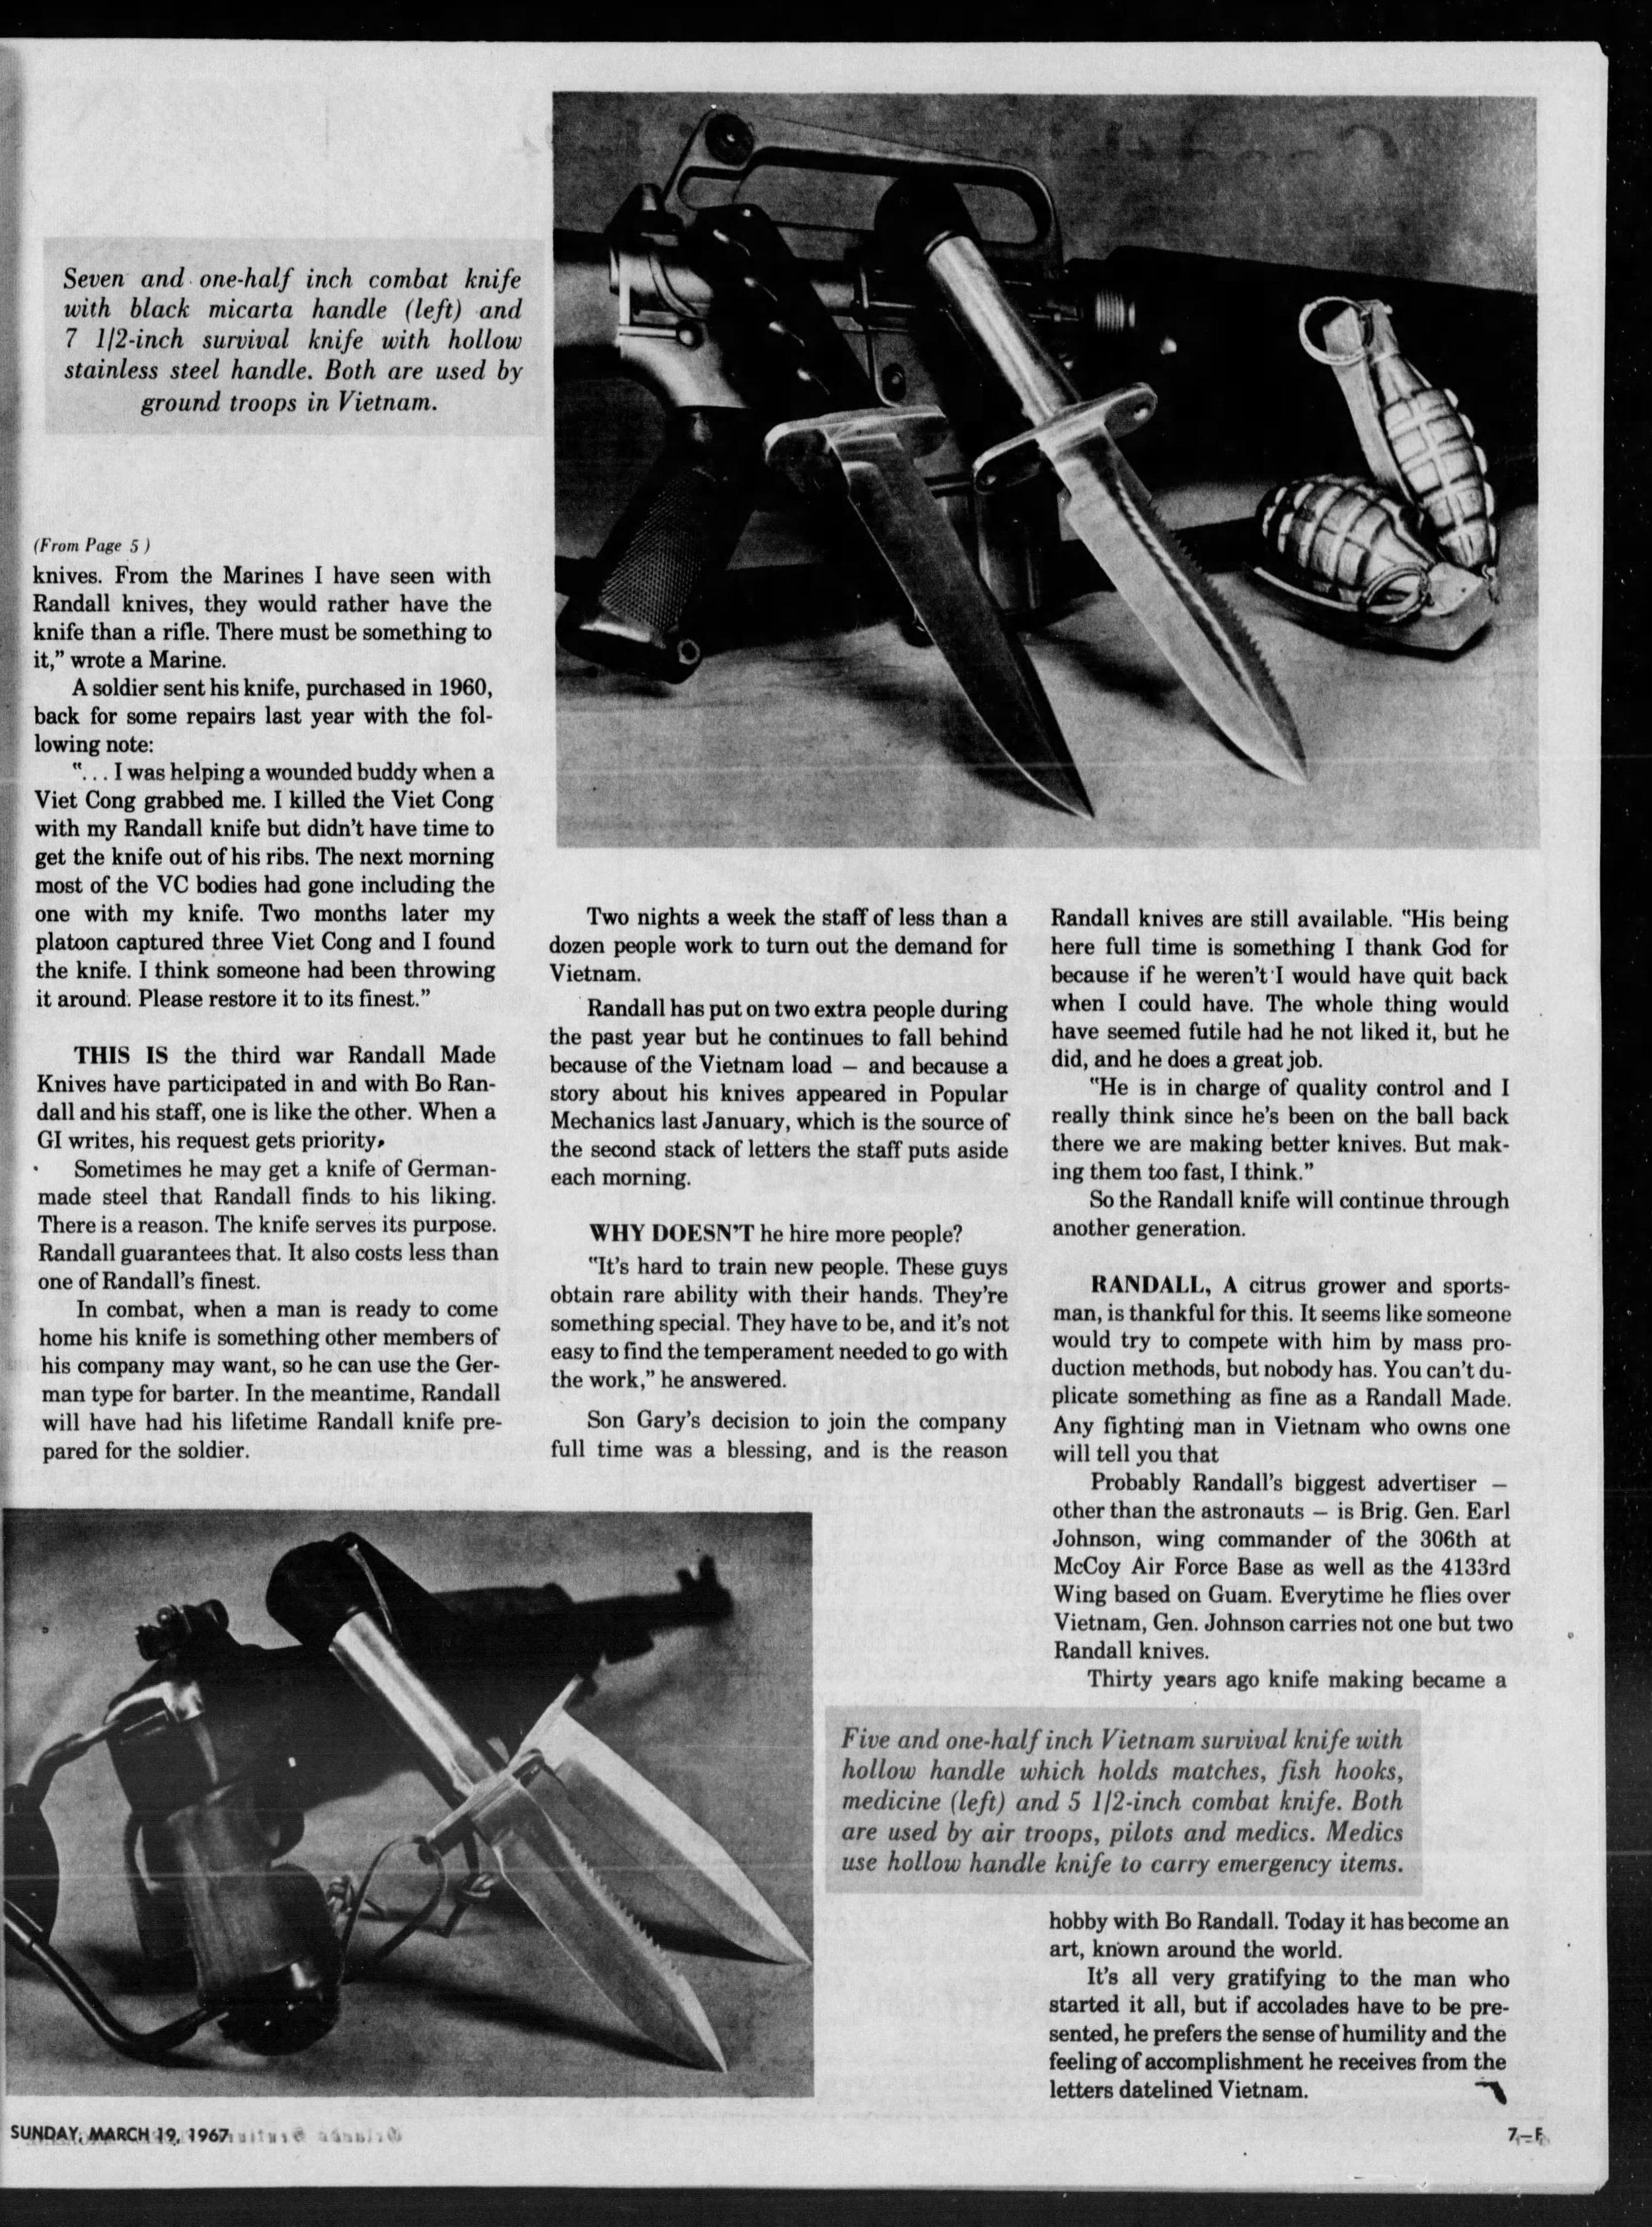 The_Orlando_Sentinel_Sun__Mar_19__1967_ (1).jpg